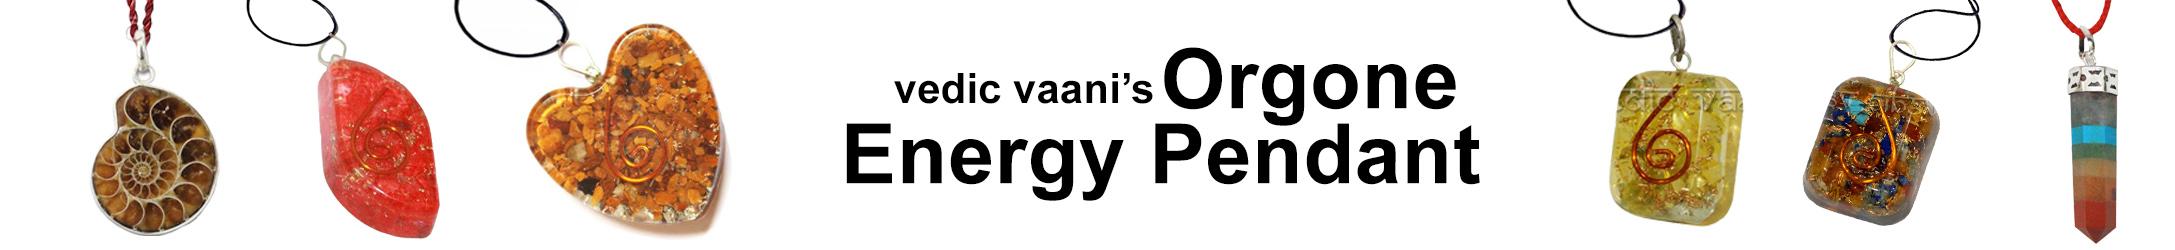 Orgone Energy Pendant